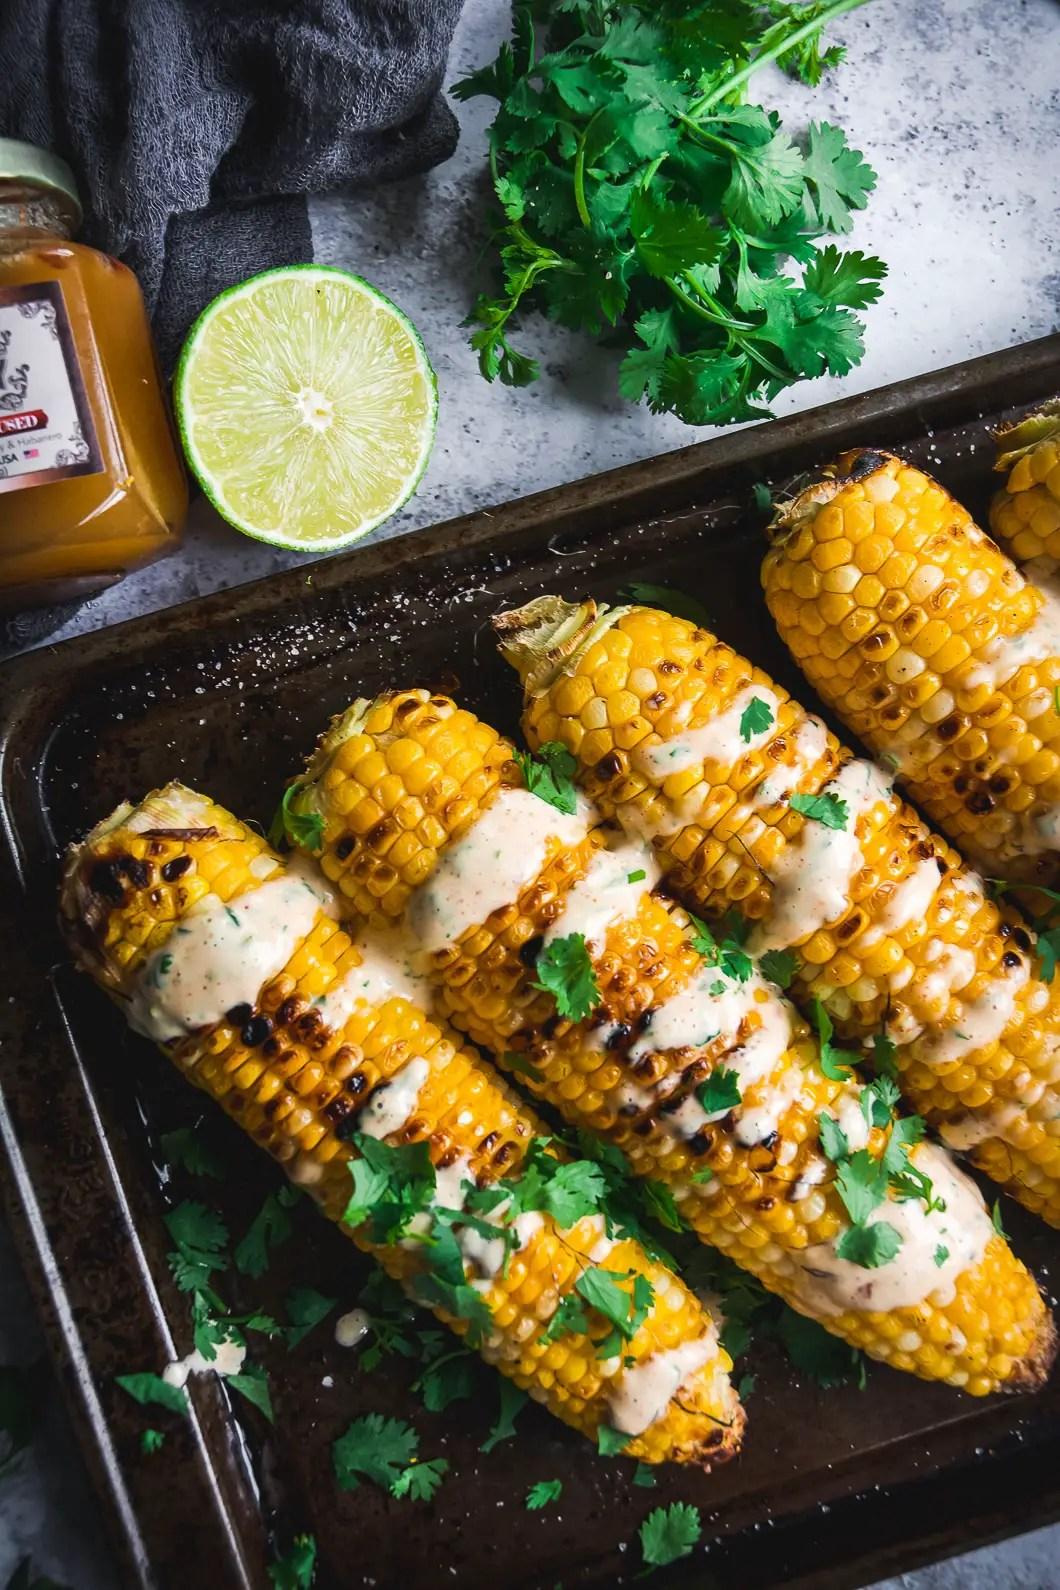 Grilled Corn with Spicy Habanero Honey Mayo